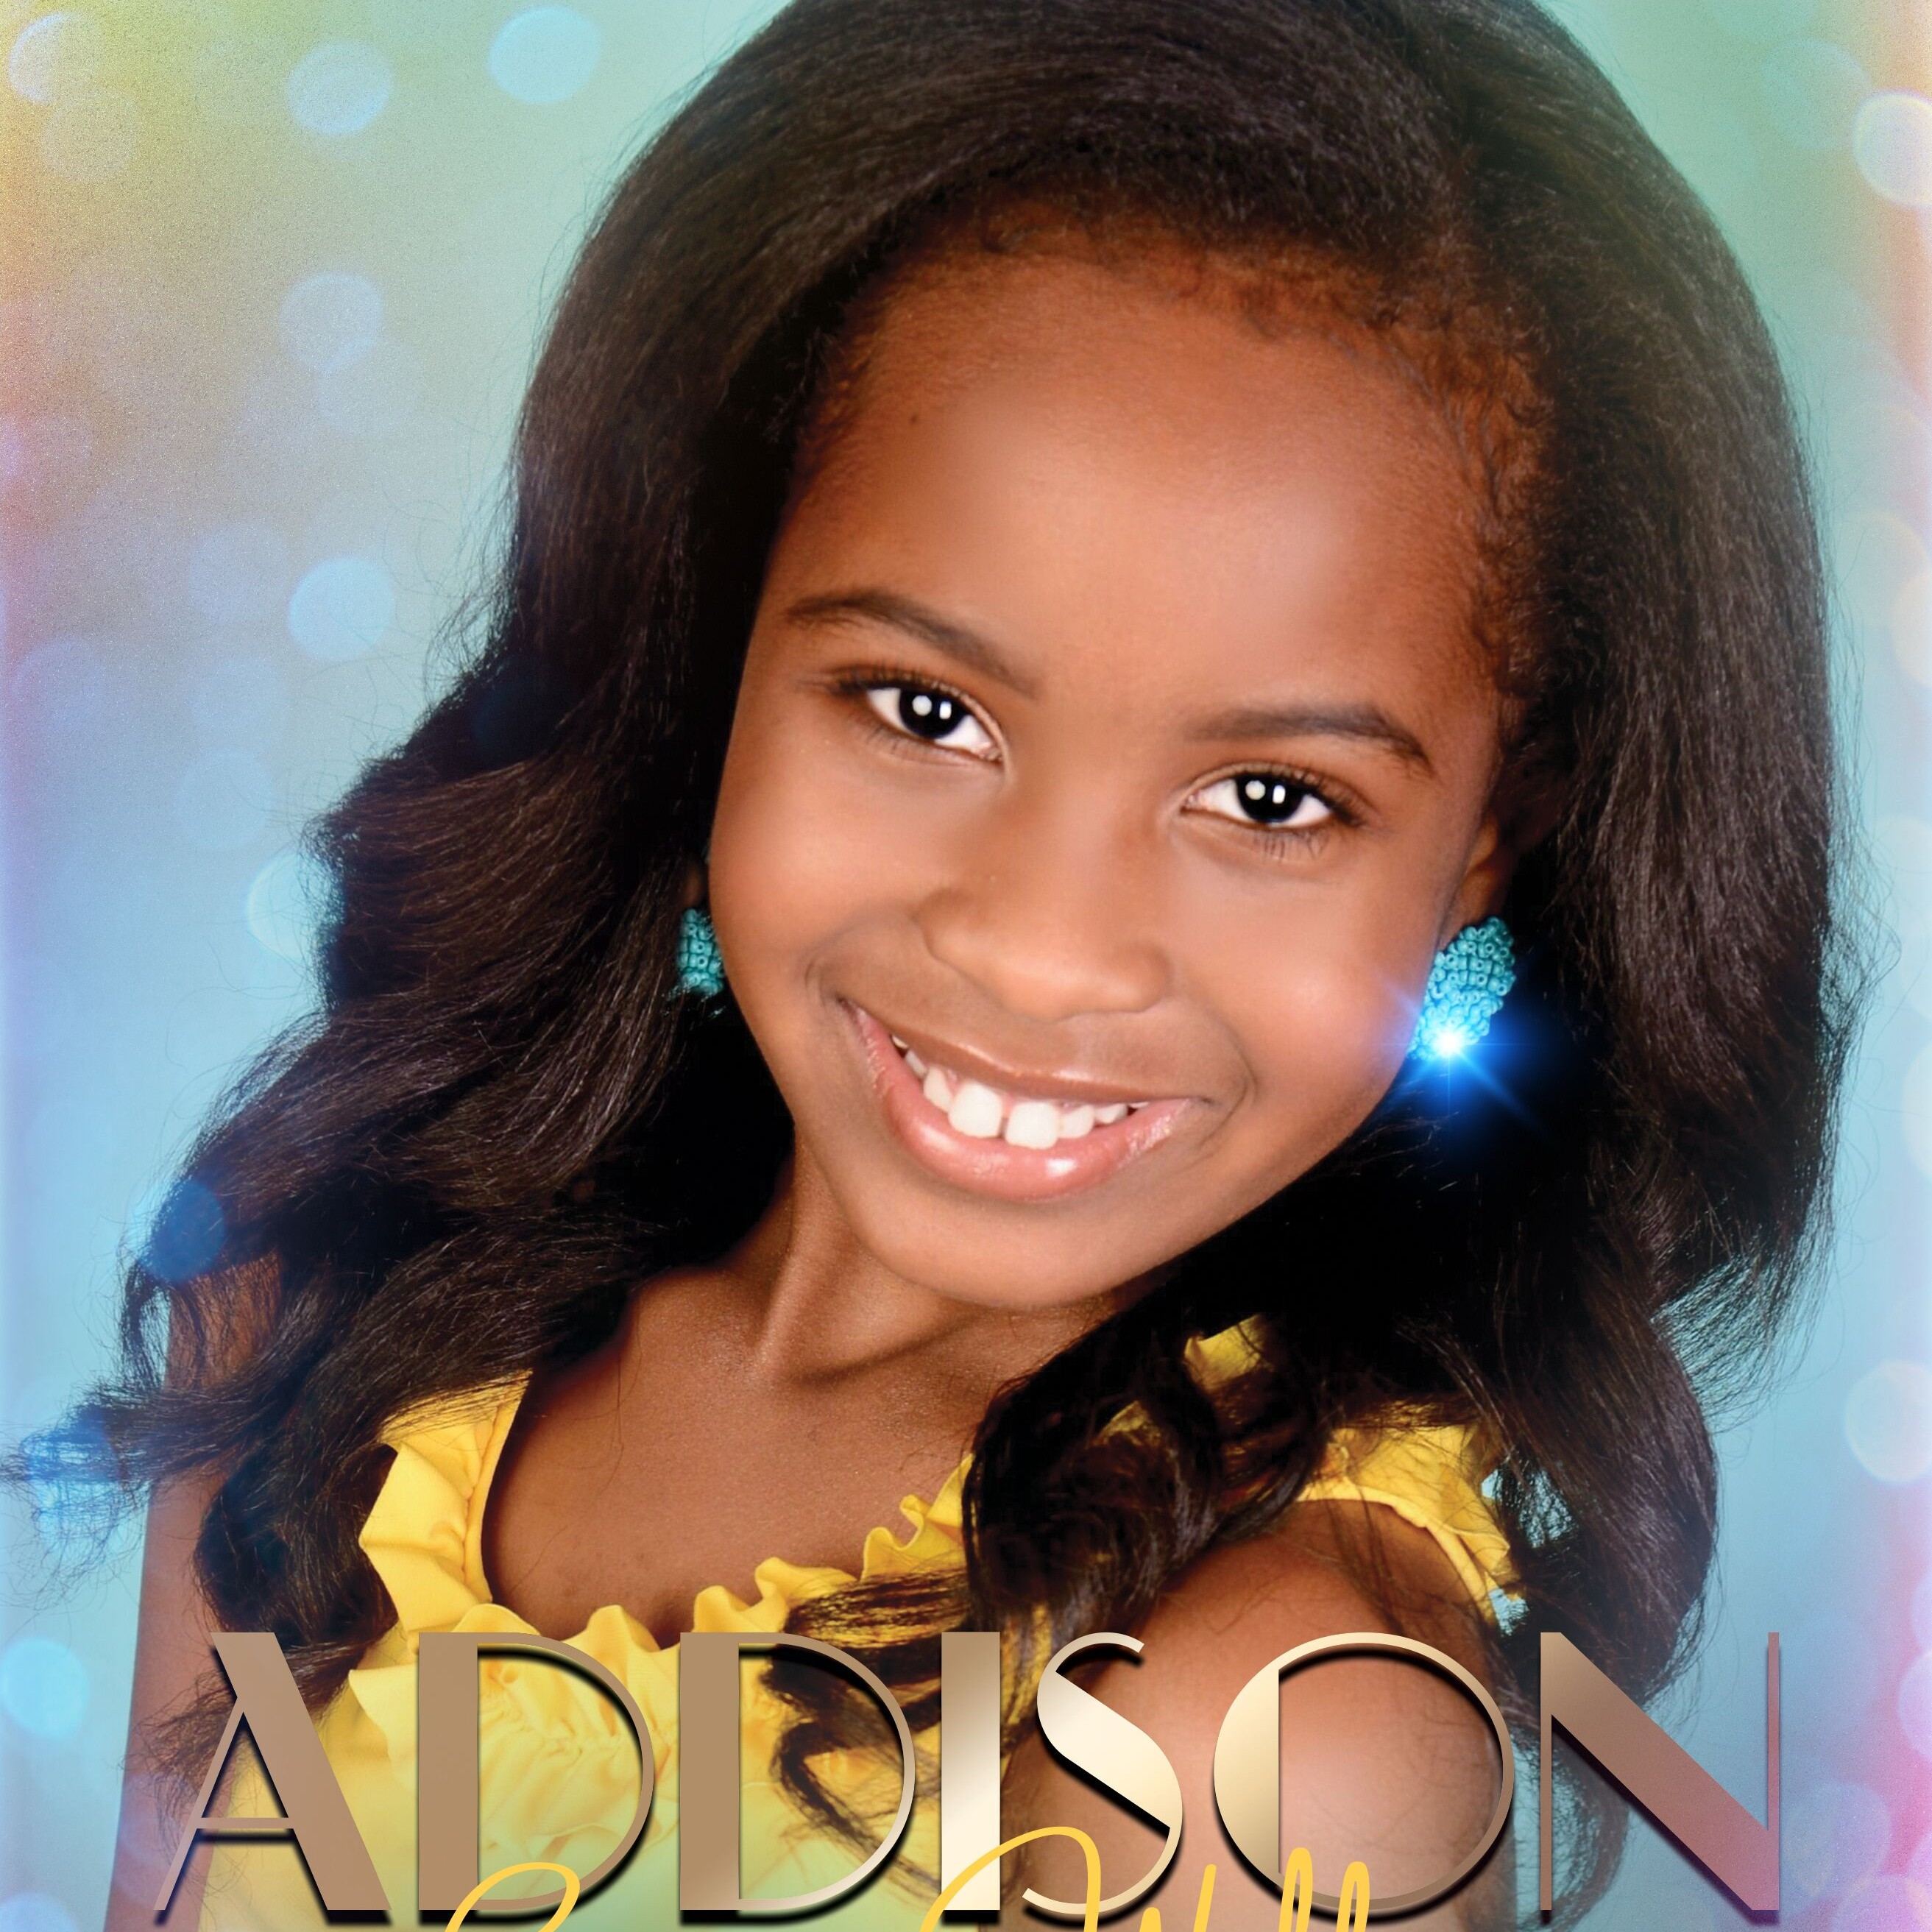 Addison Wells